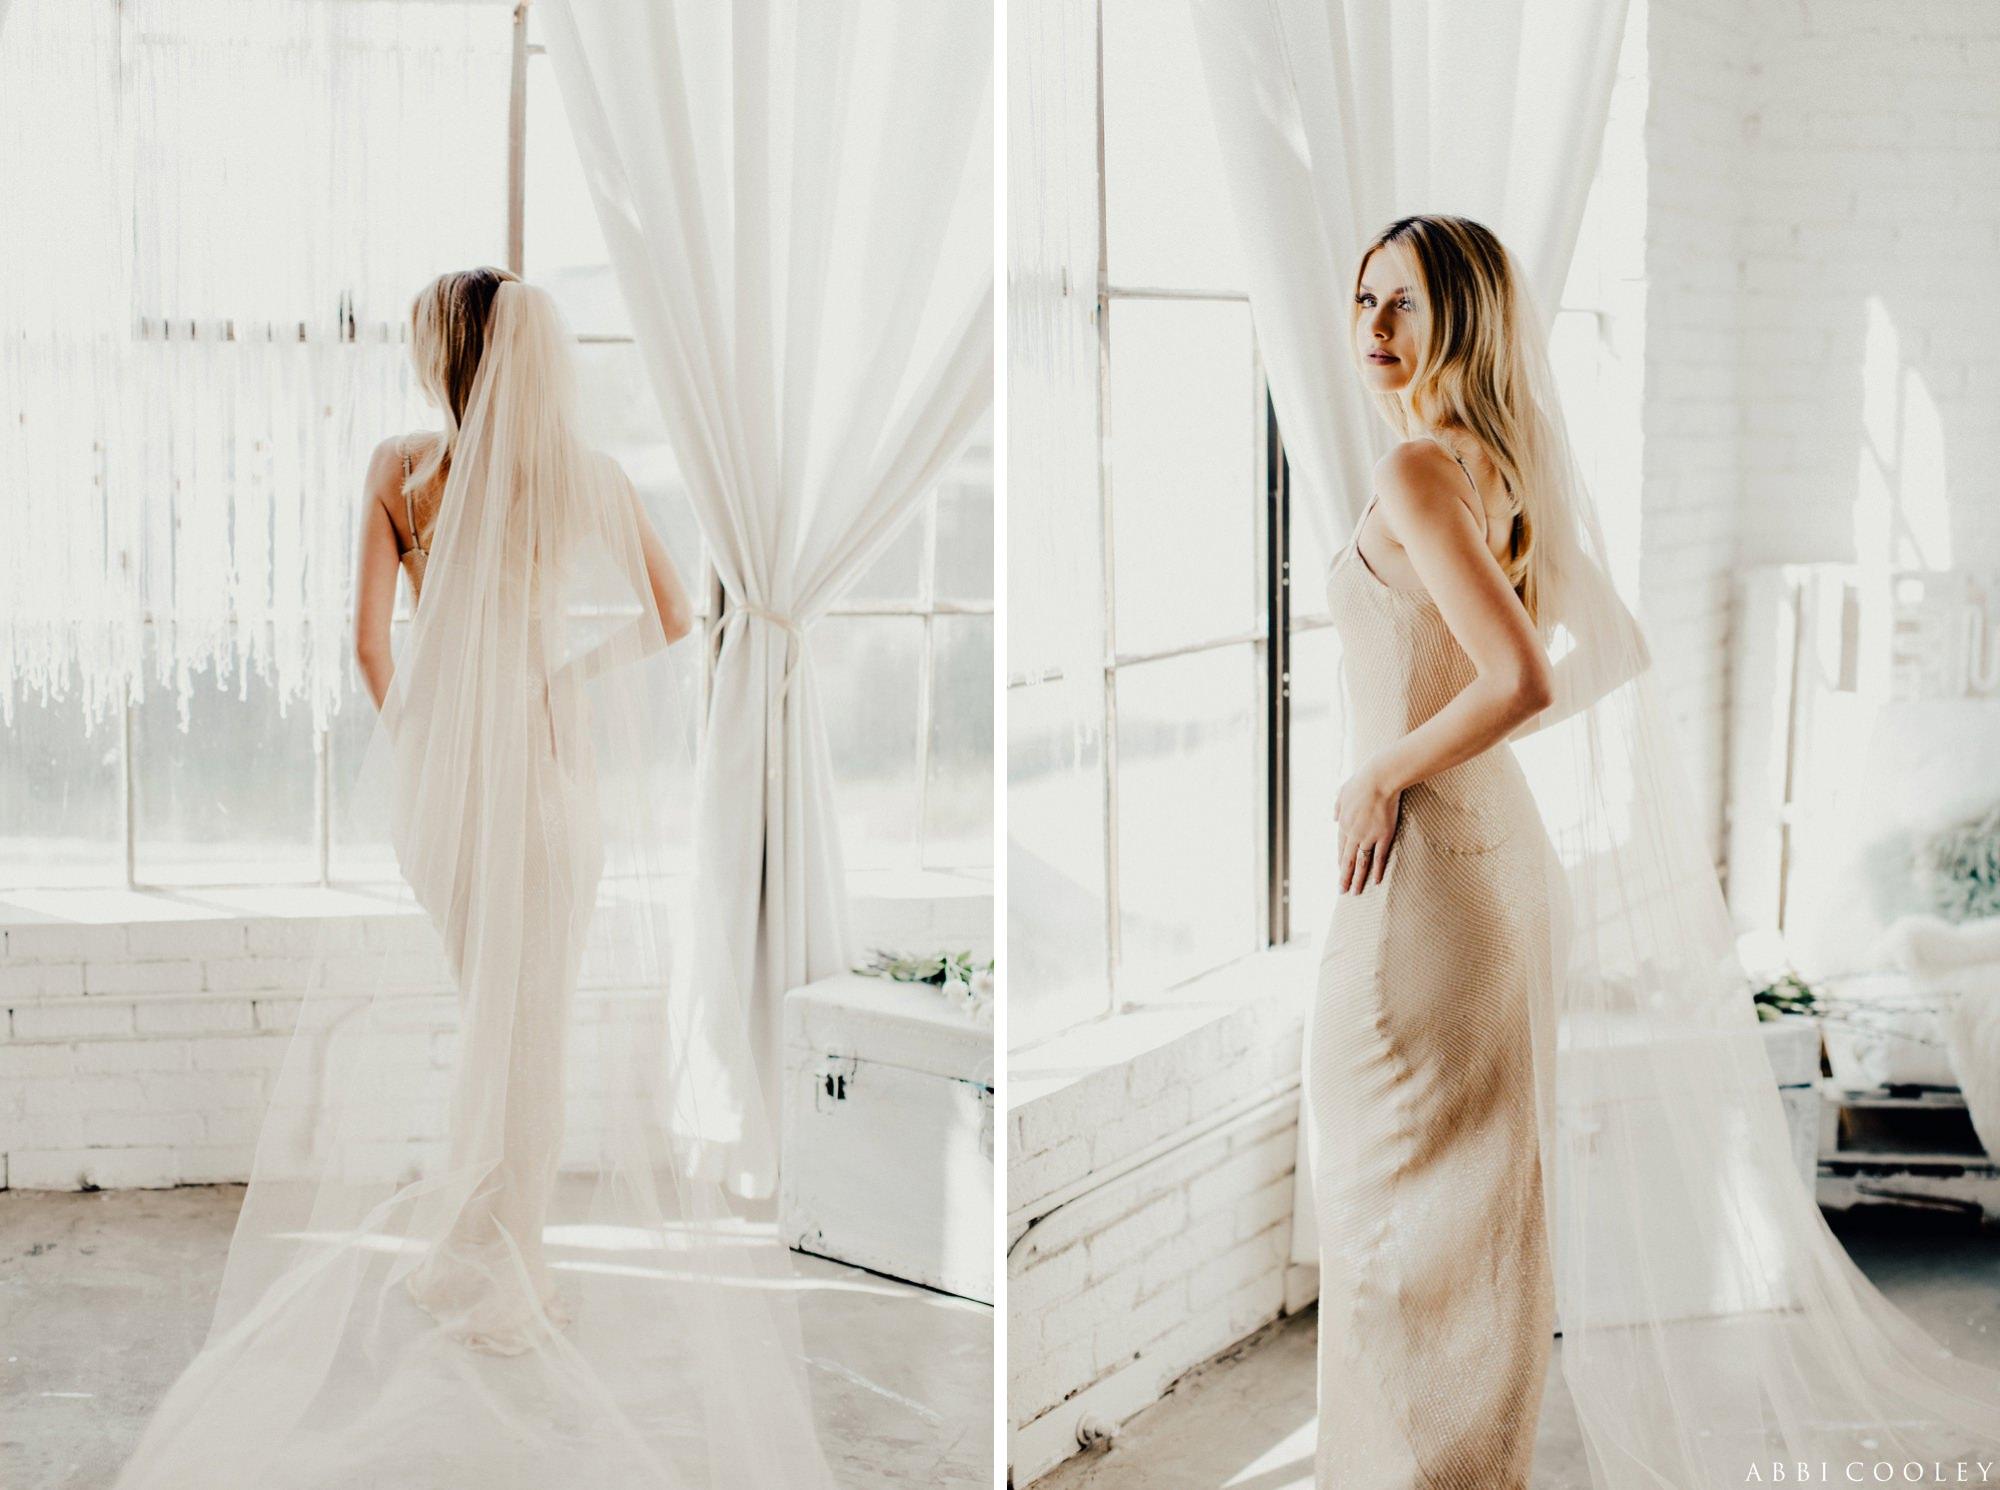 los angeles designer The Veiled Beauty 2017 Lookbook